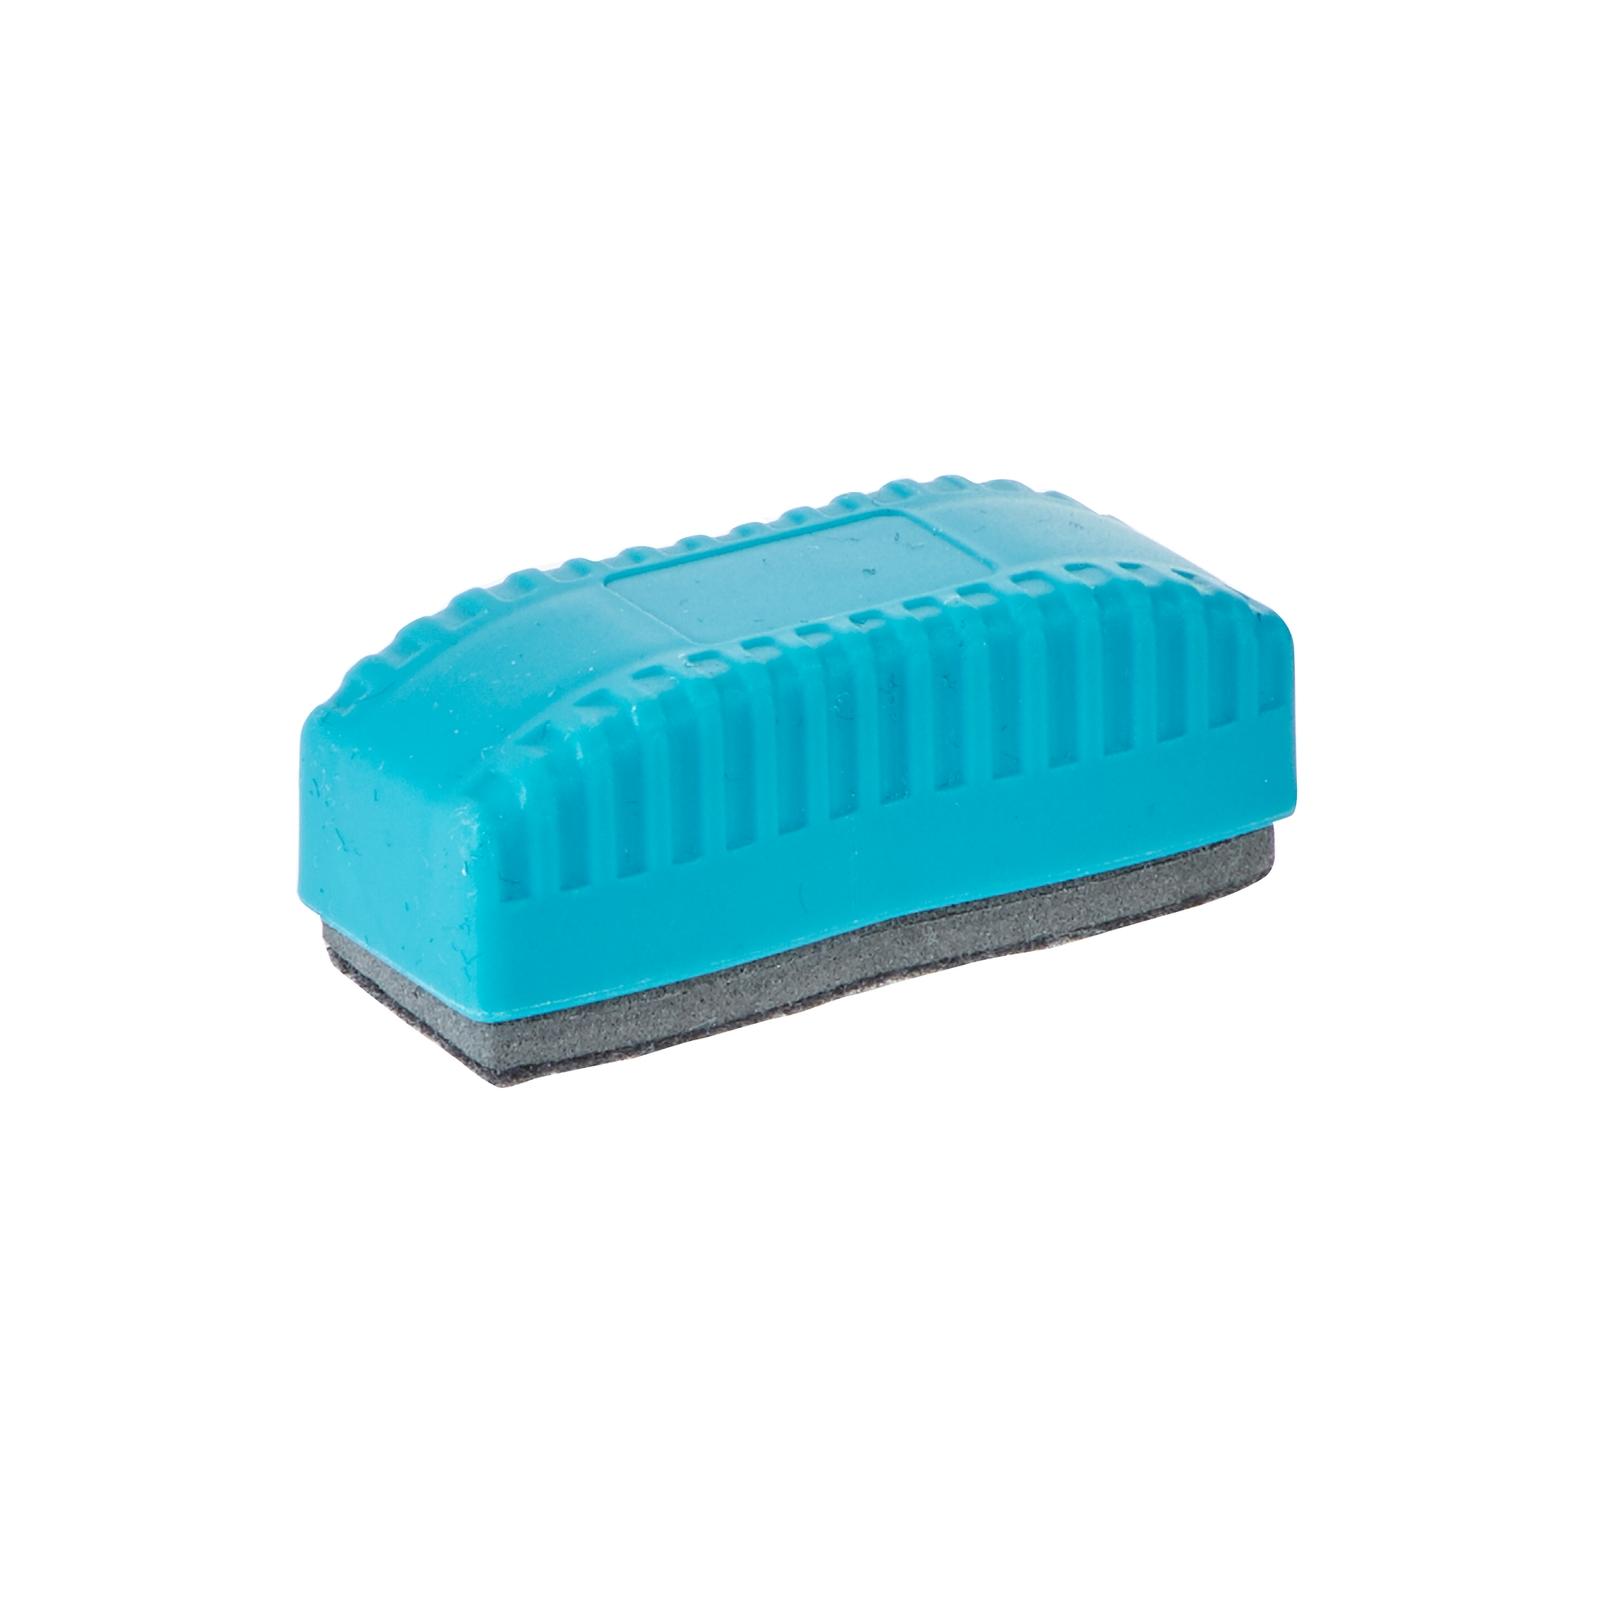 Classmates Mini Magnetic Whiteboard Erasers